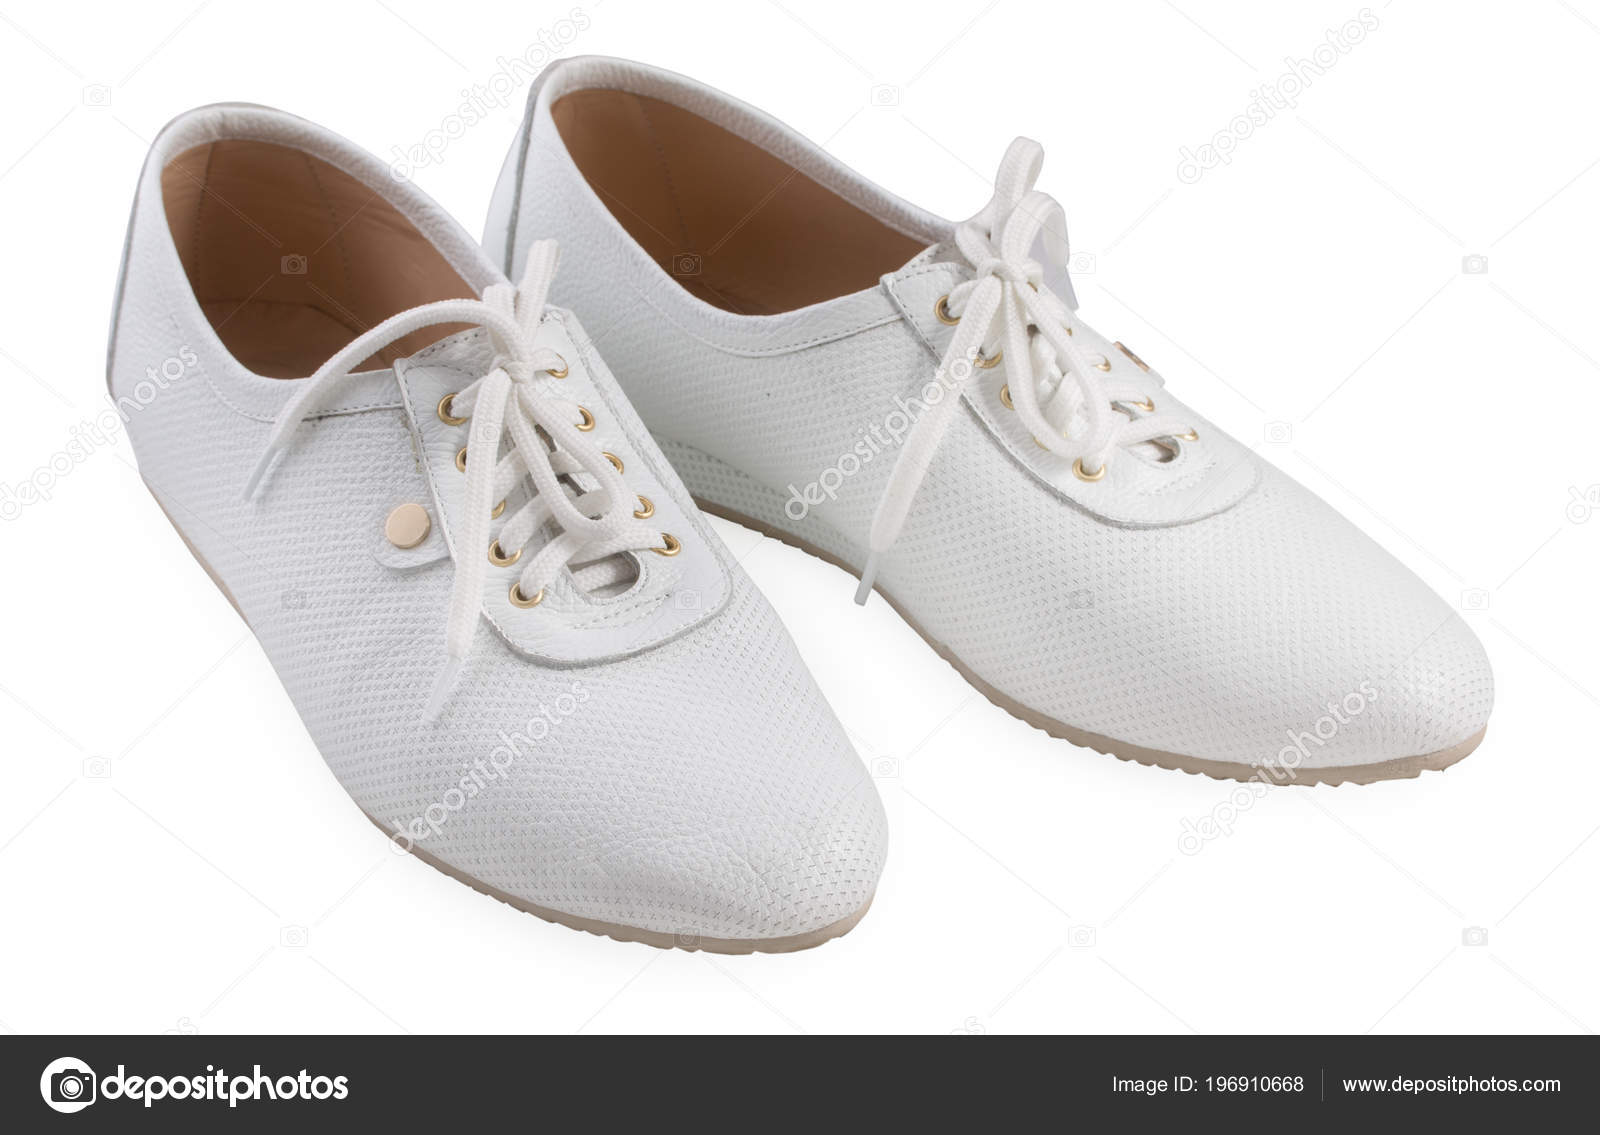 12df6d1258e Ζευγάρι γυναικεία αθλητικά παπούτσια απομονωθεί σε λευκό φόντο, εσωτερικη — Εικόνα  από 3249855.gmail.com| ...